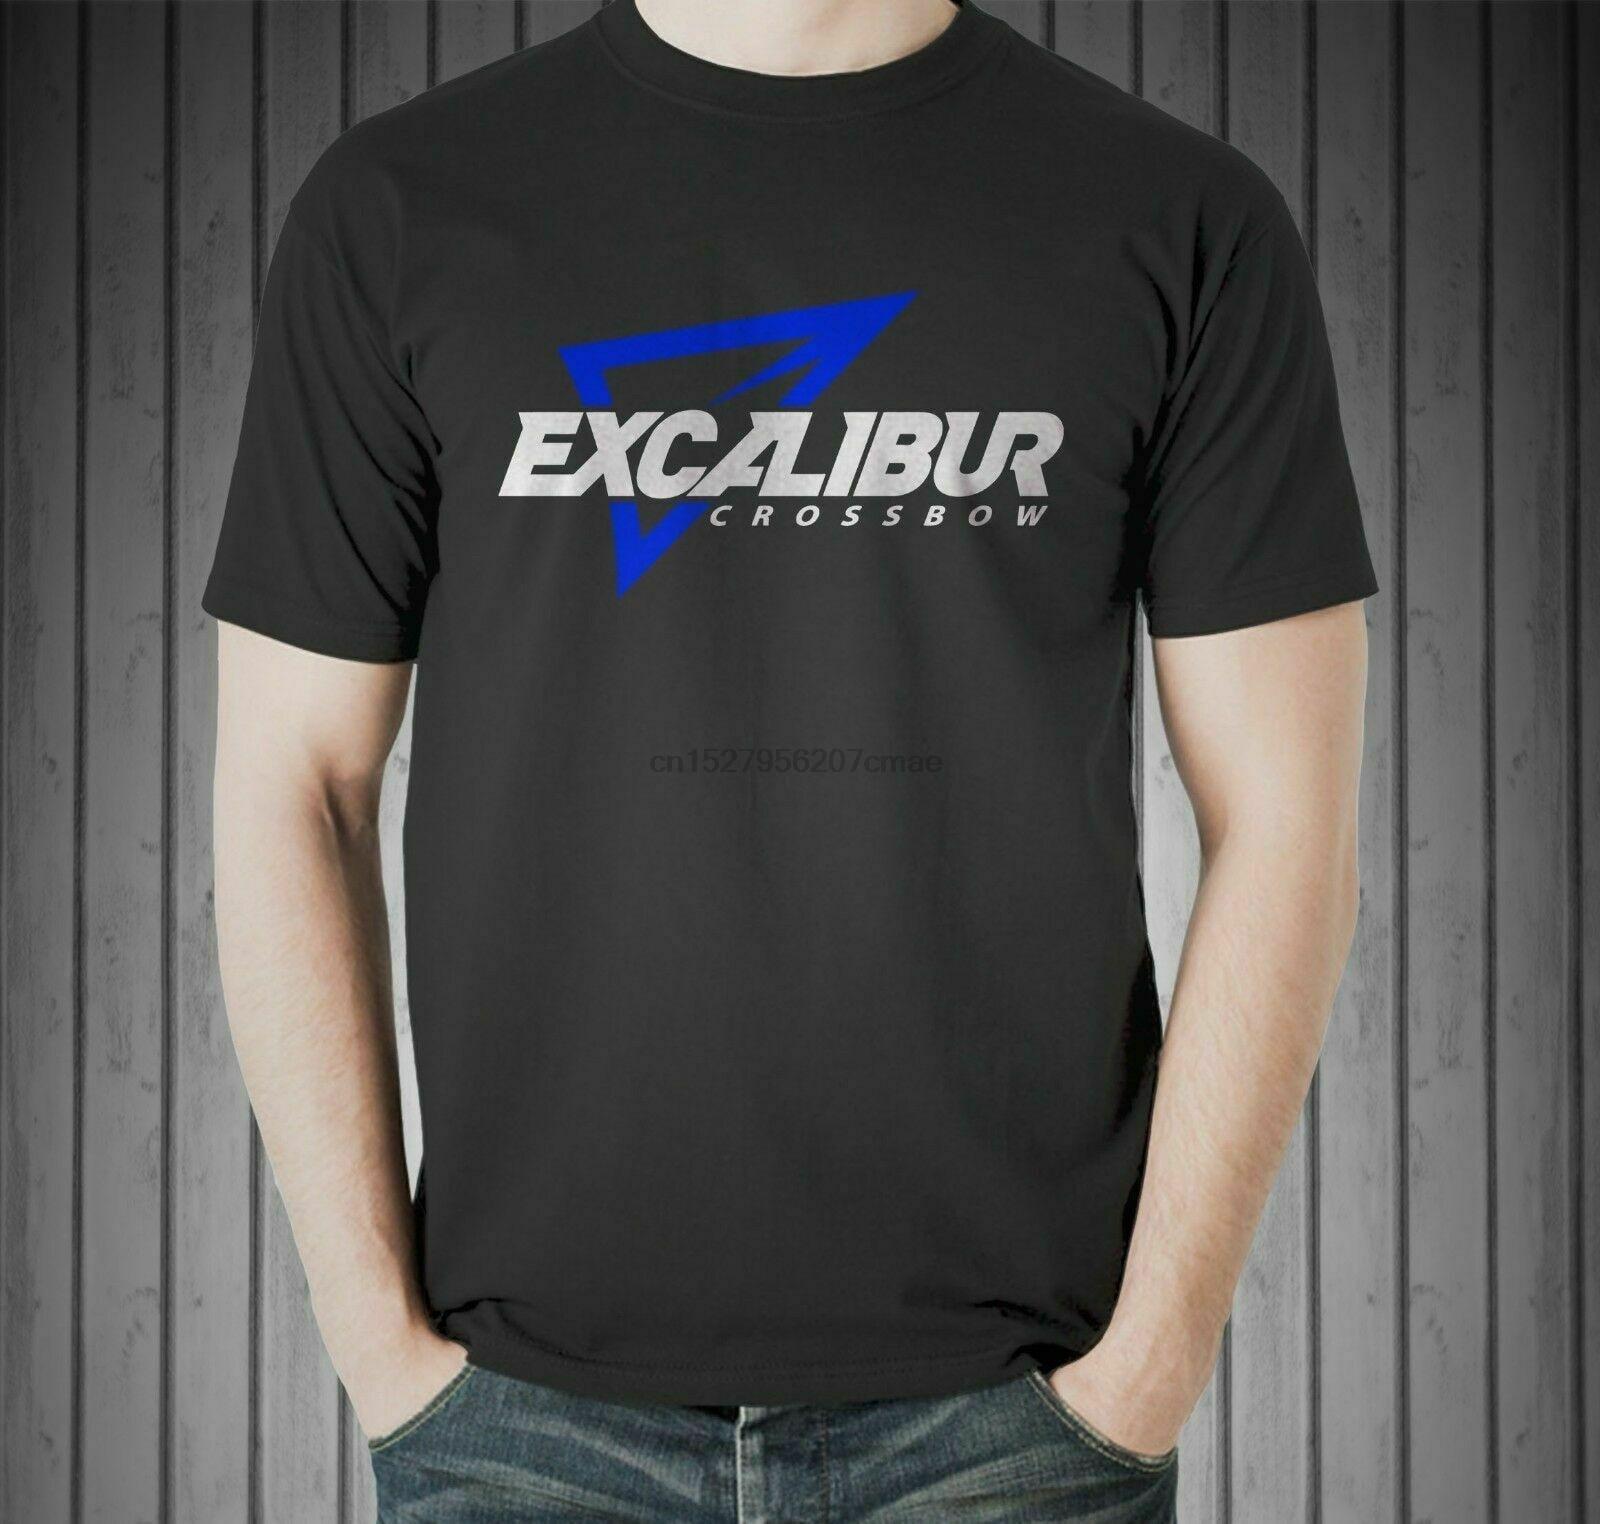 Excalibur logotipo besta caça veados composto arco seta tamanho eua camiseta en (1)